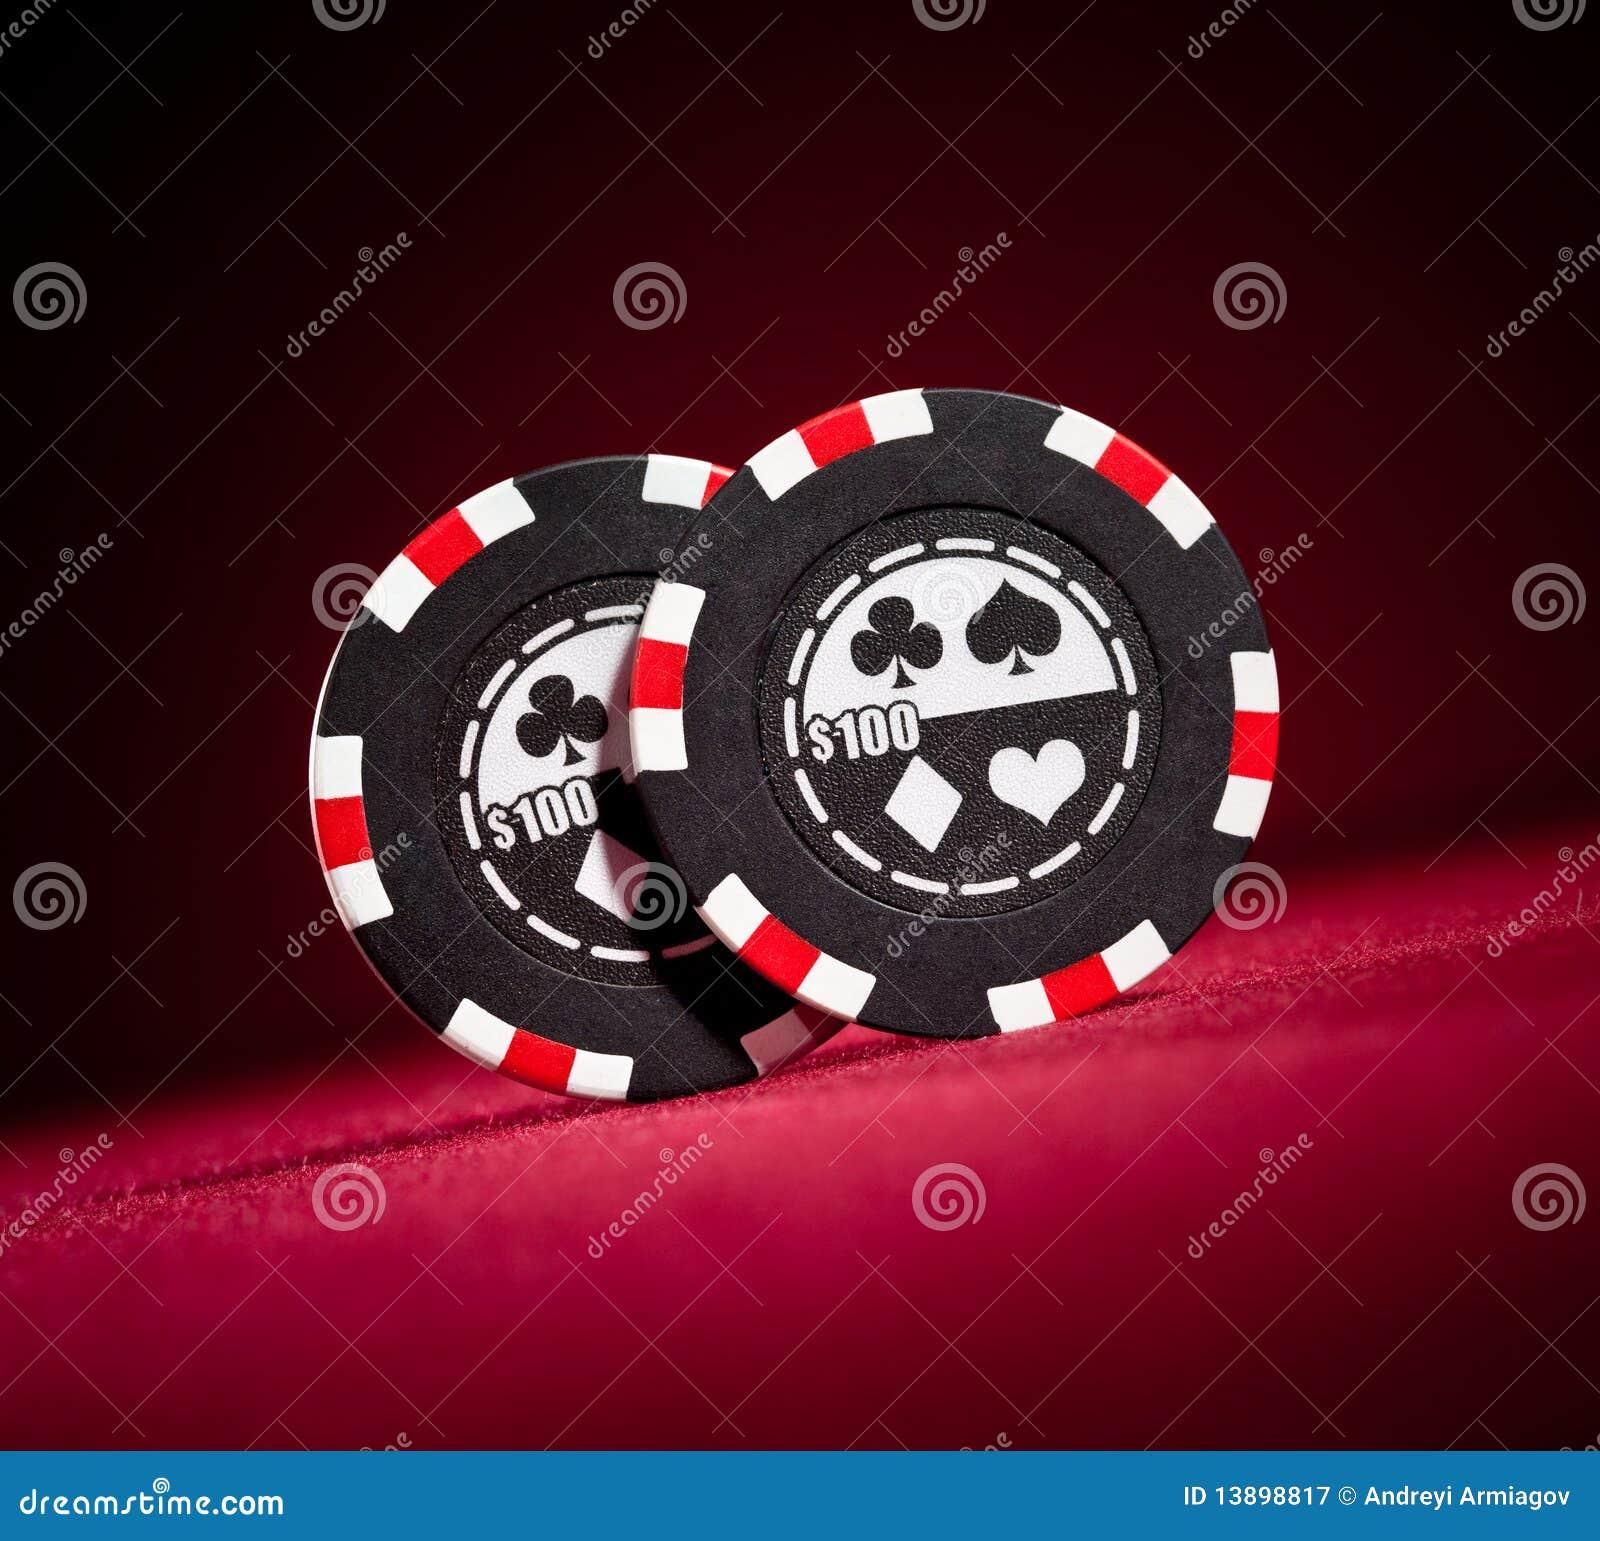 bet356 casino